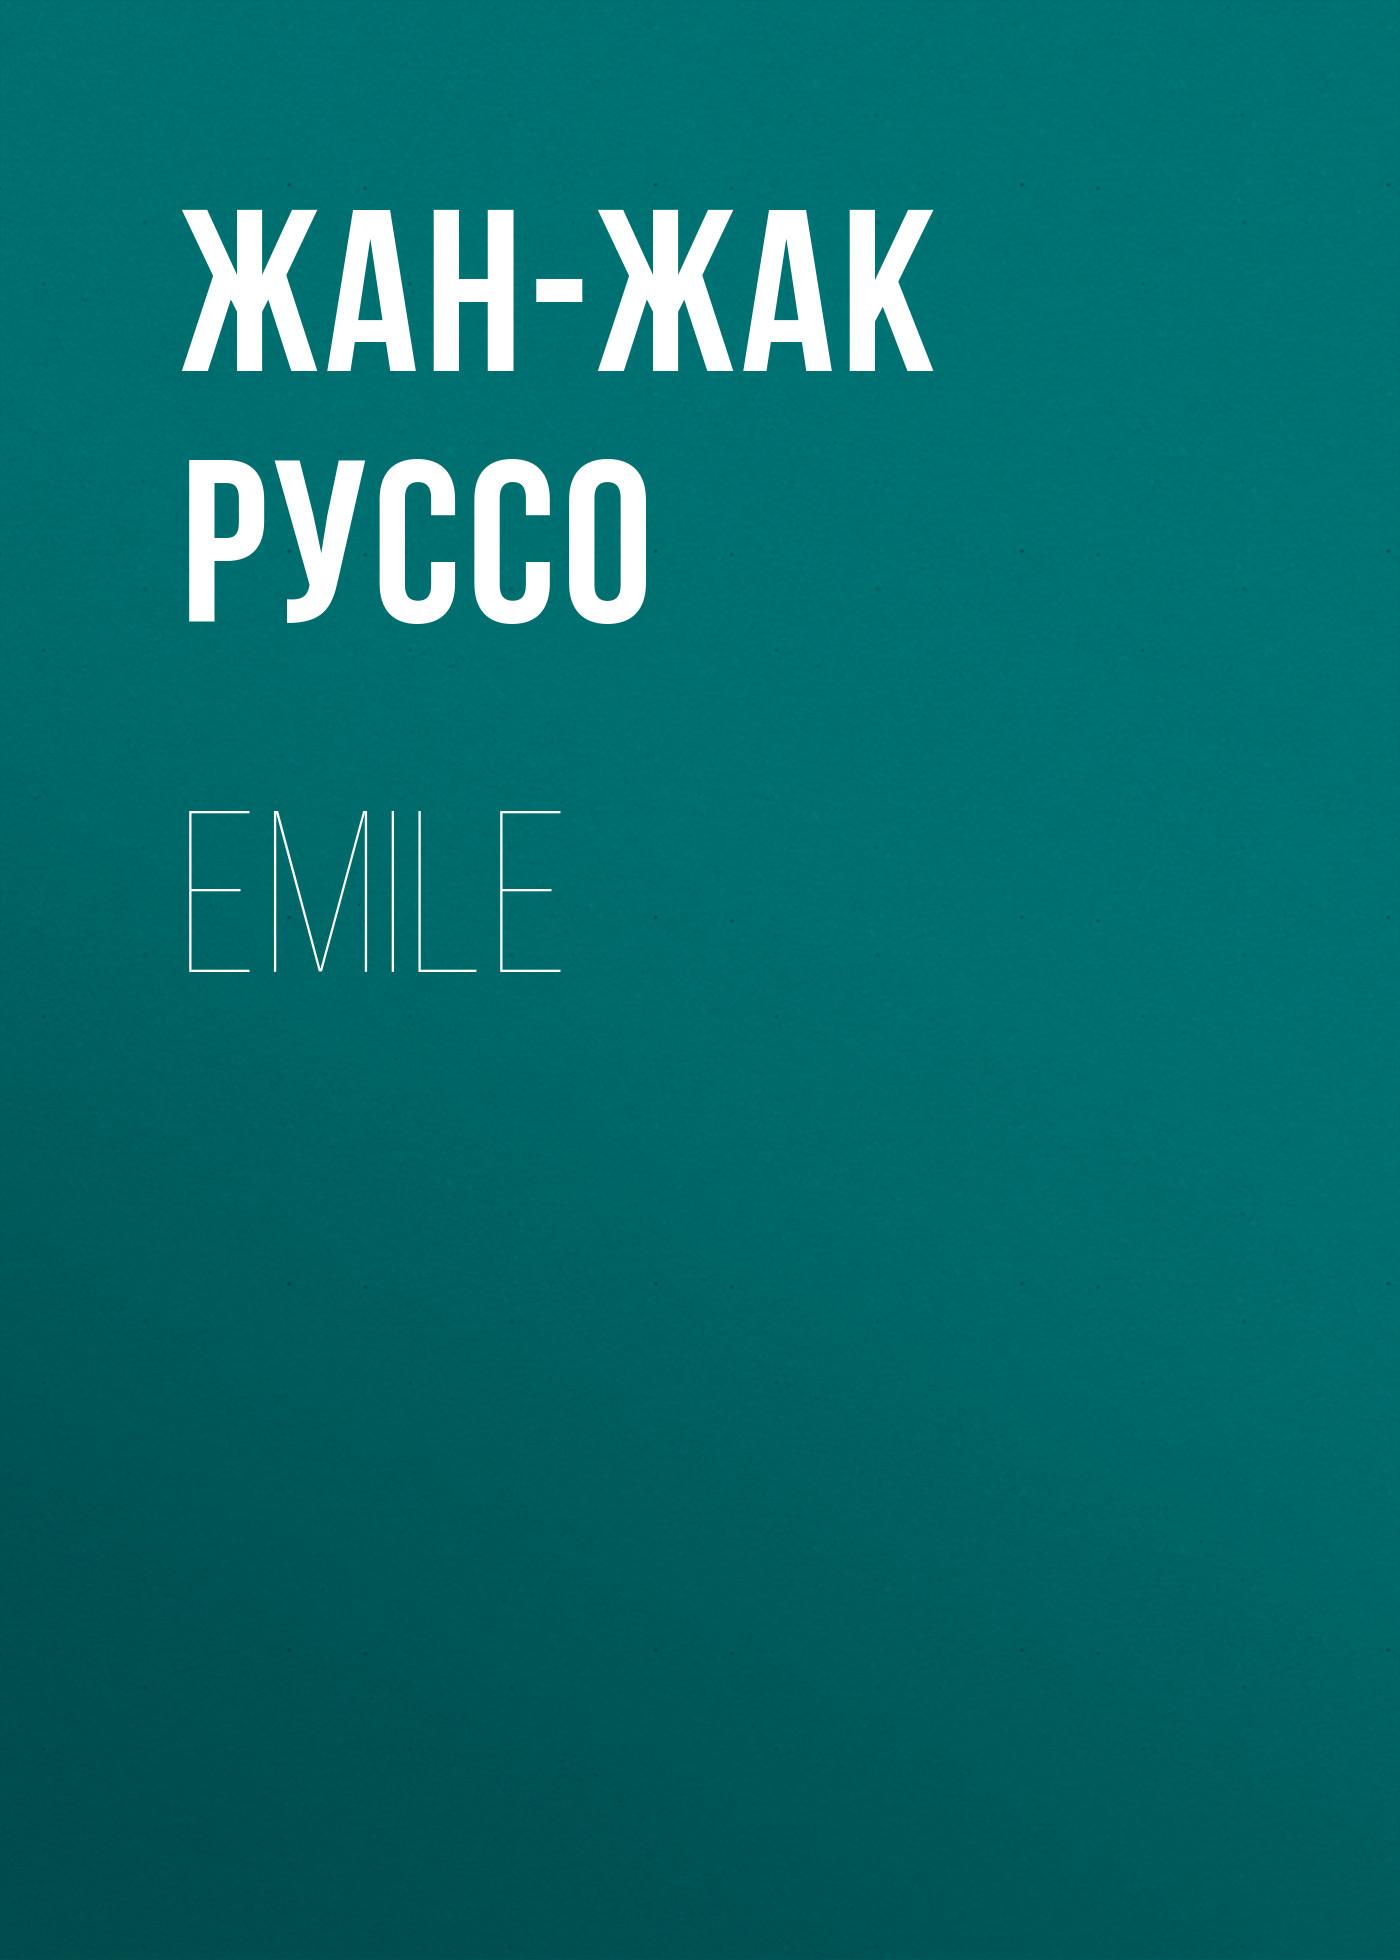 Жан-Жак Руссо Emile emile henry форма для запекания картофеля 2 л 24 см гранат 345500 emile henry